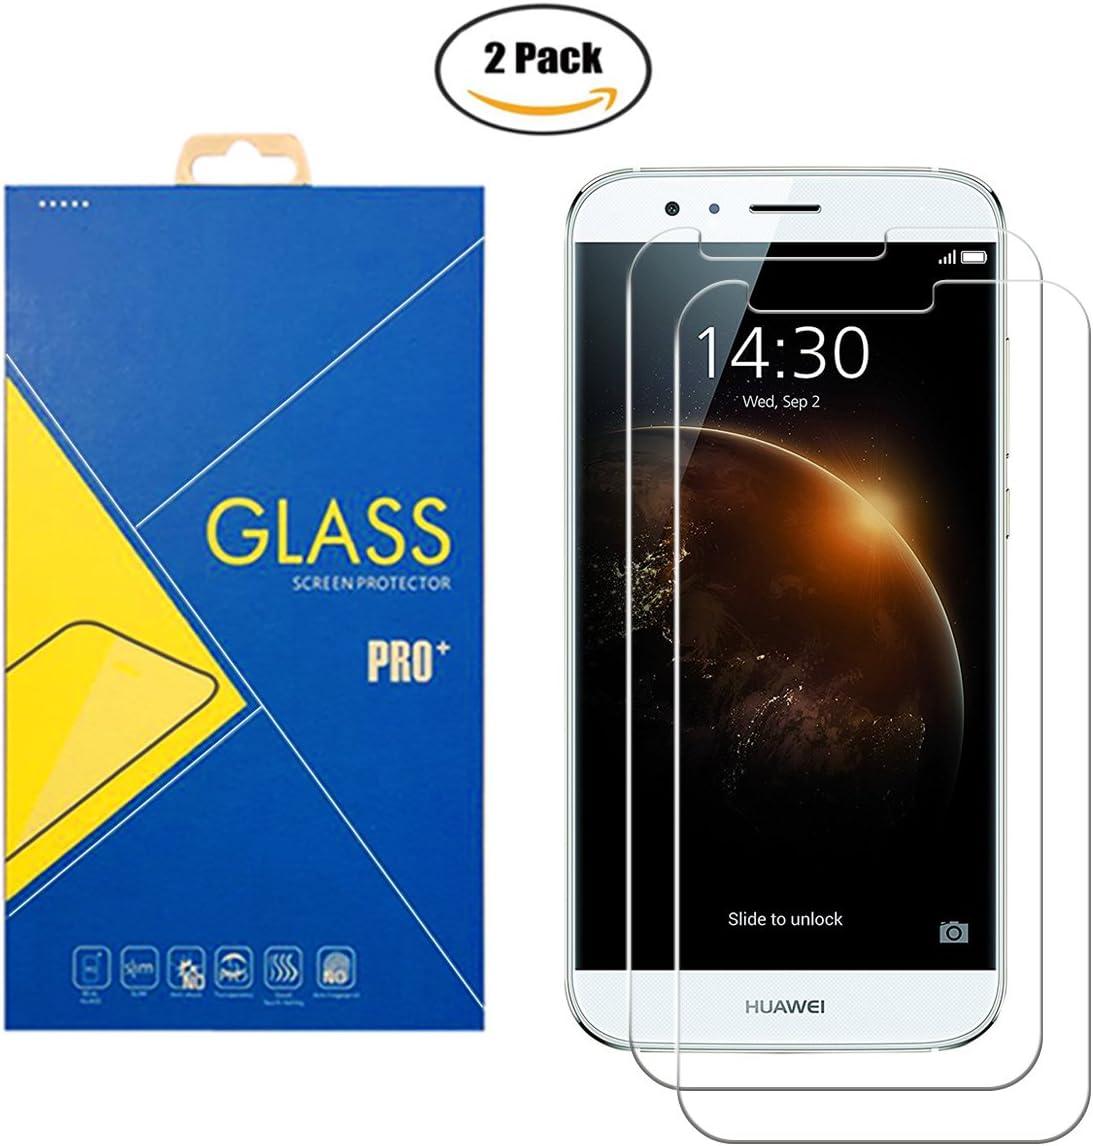 2 Pack] Protector Cristal Vidrio Templado Huawei G8 / GX8 / G7 ...